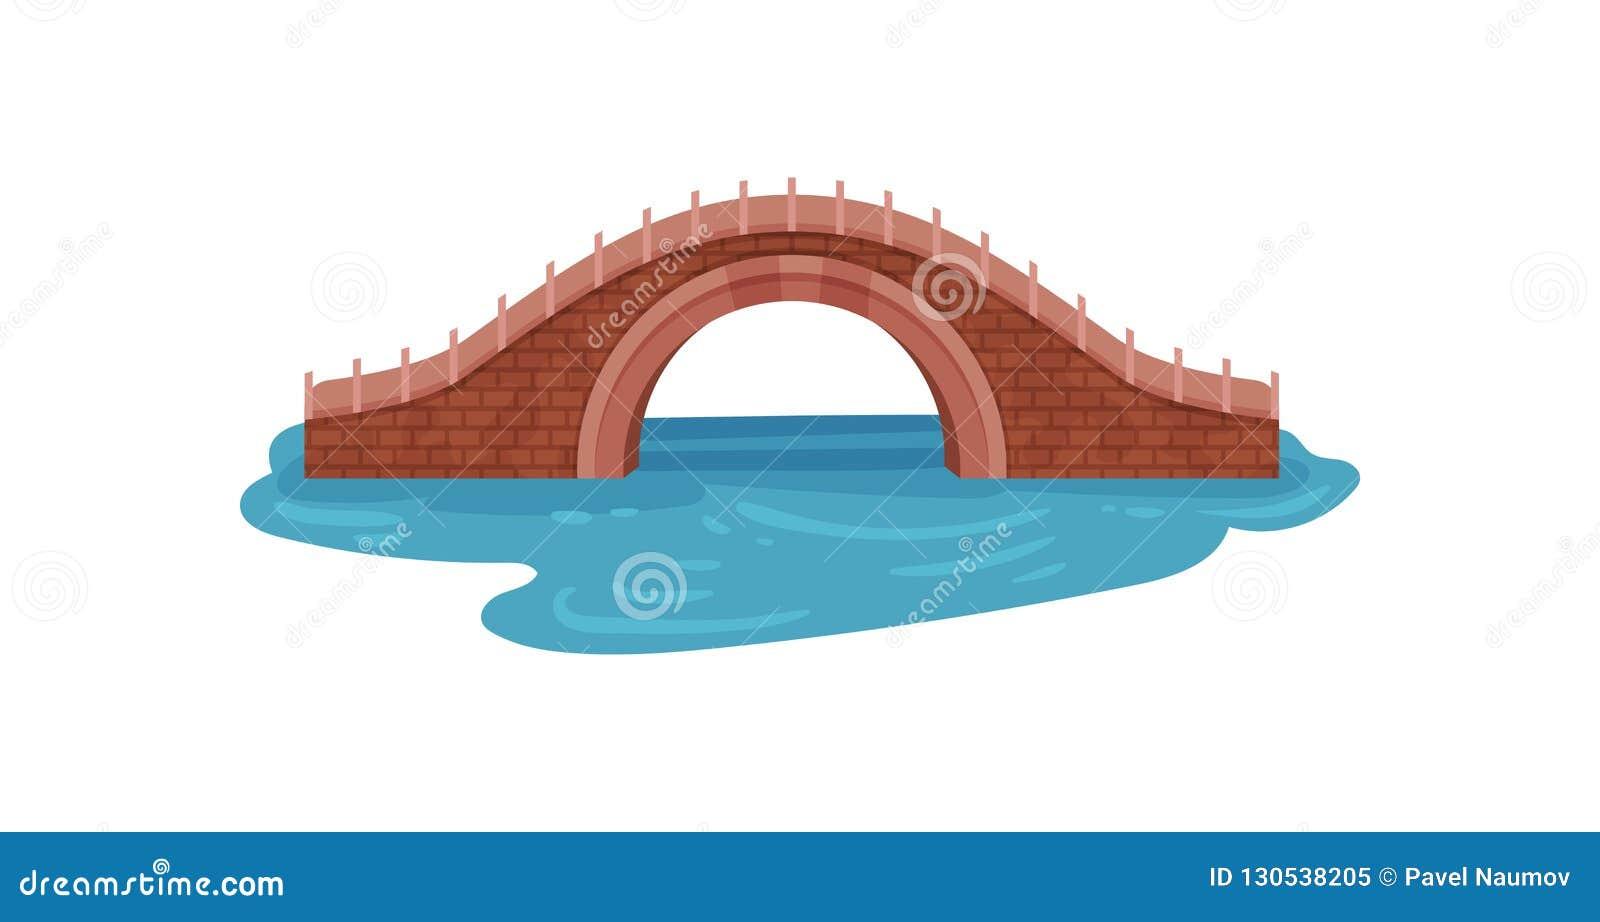 Oude baksteenbrug over blauwe rivier Boogvoetgangersbrug Landschapselement voor stadspark Chicago Illinois, de V Vlakke vector